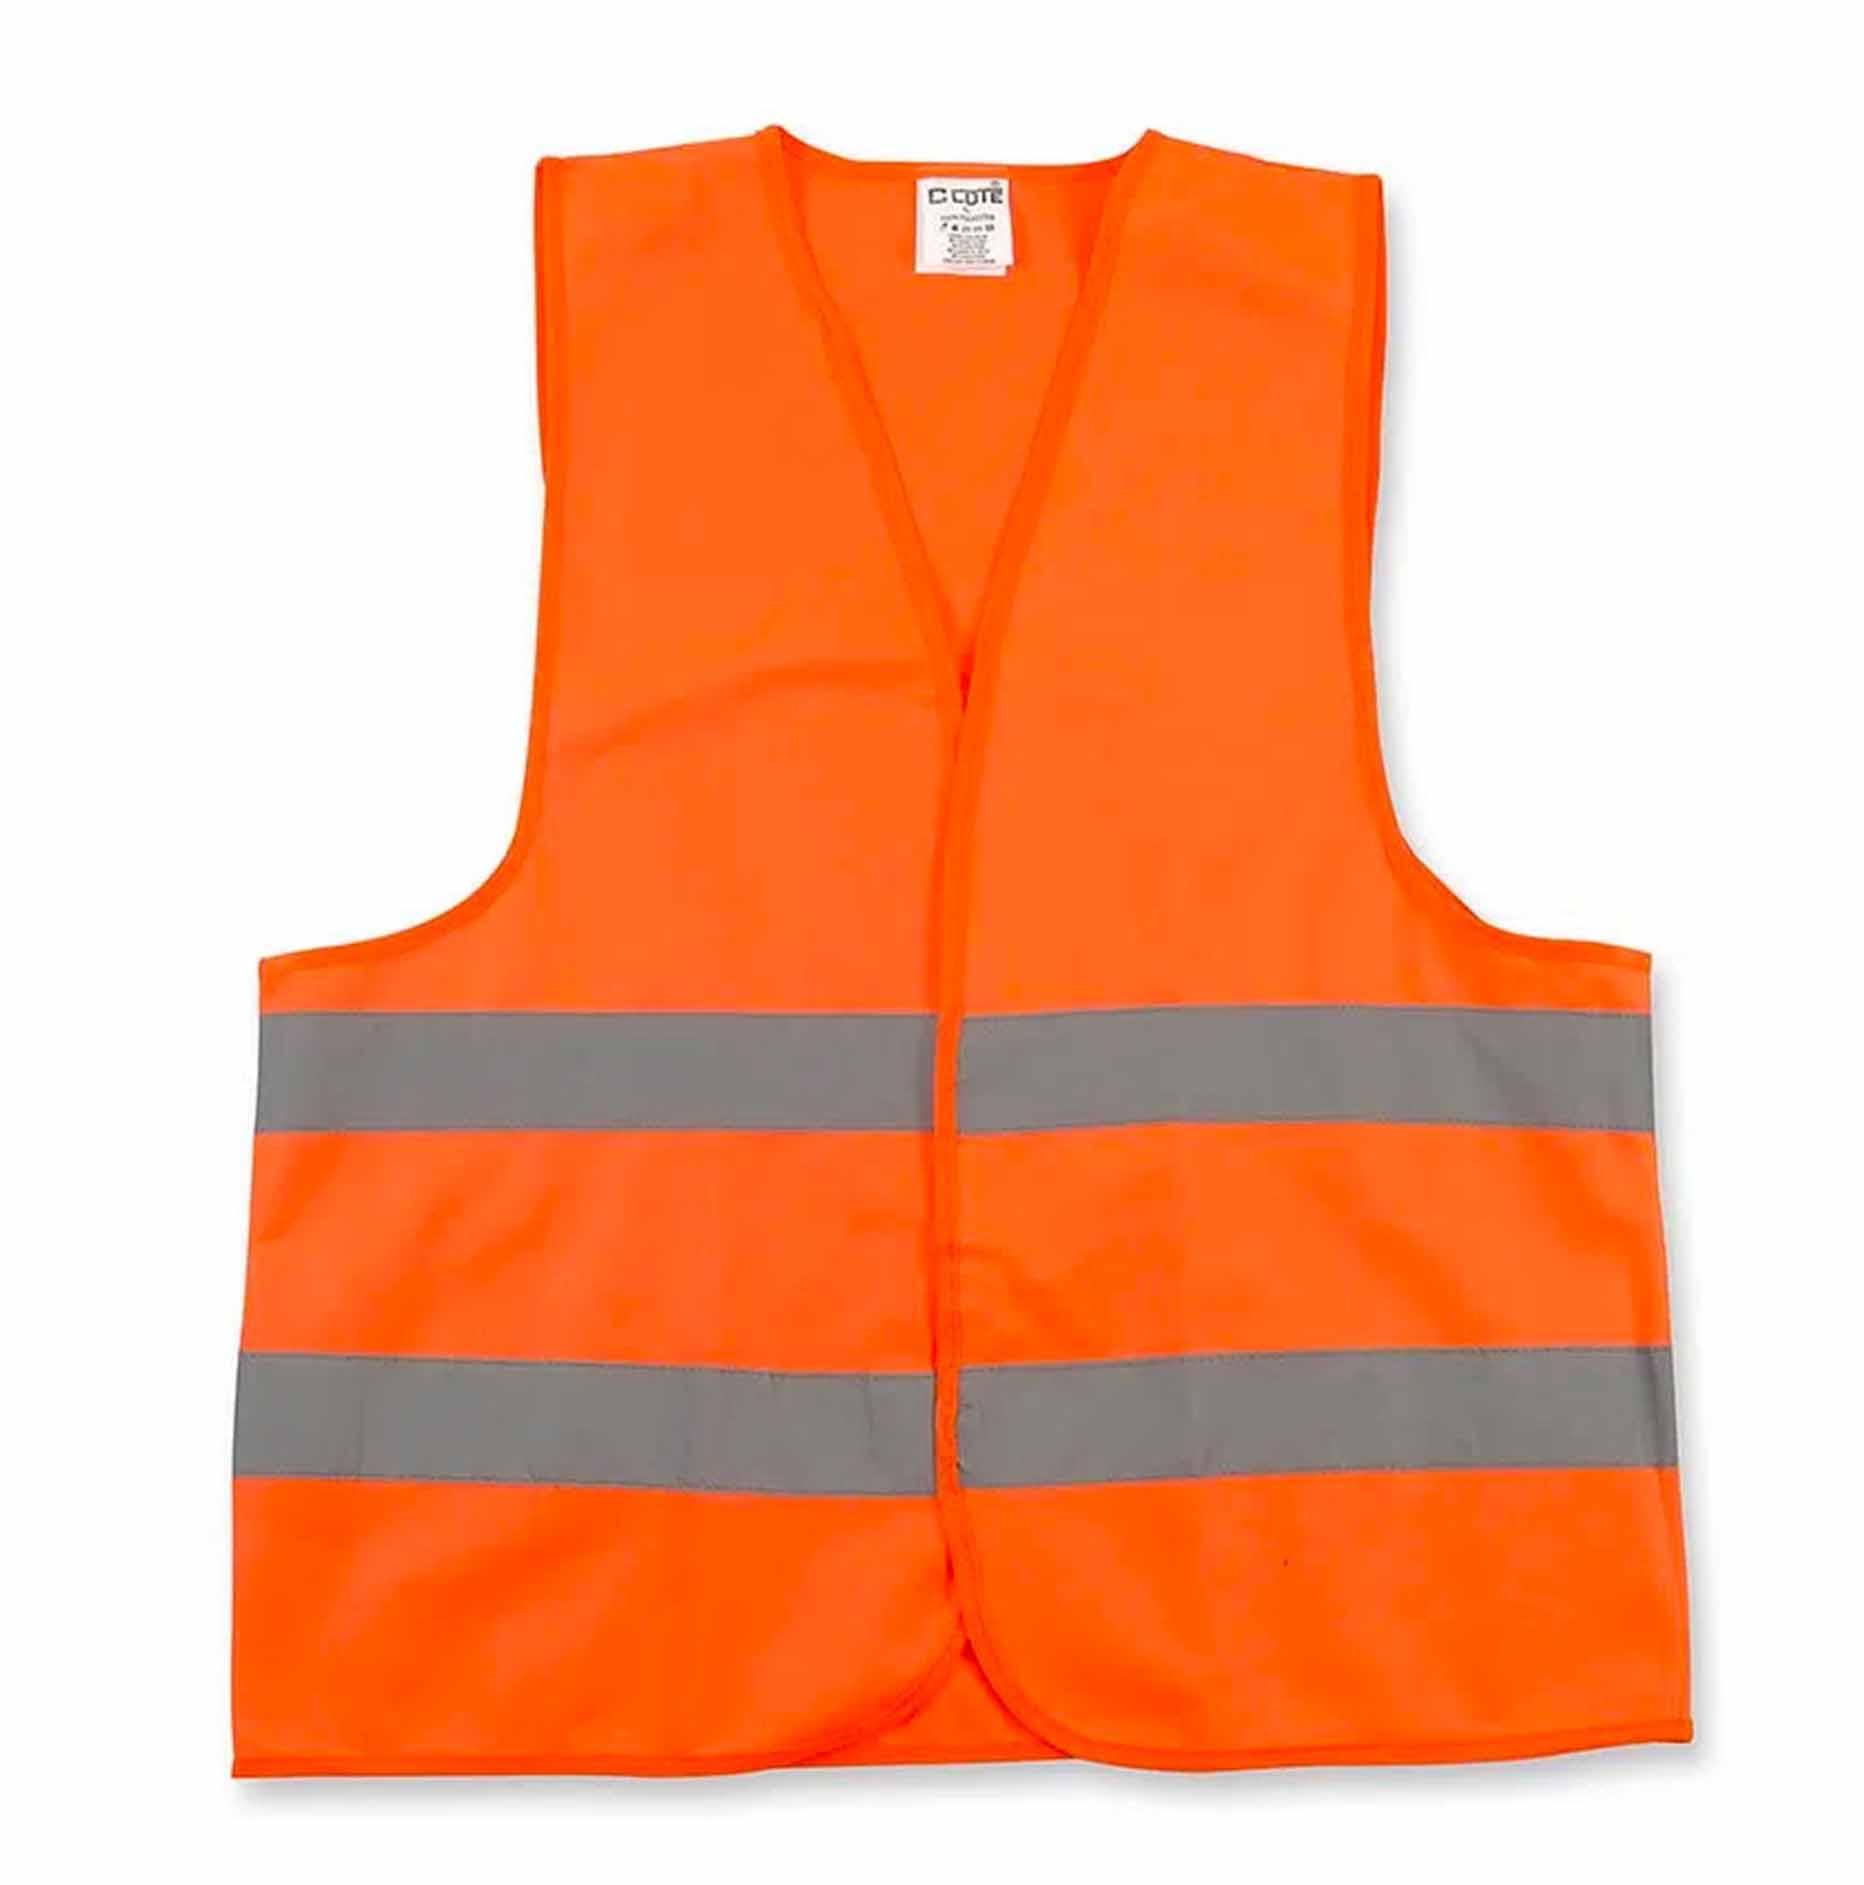 Chaleco De Seguridad Poliester Naranja Con cinta Reflectiva